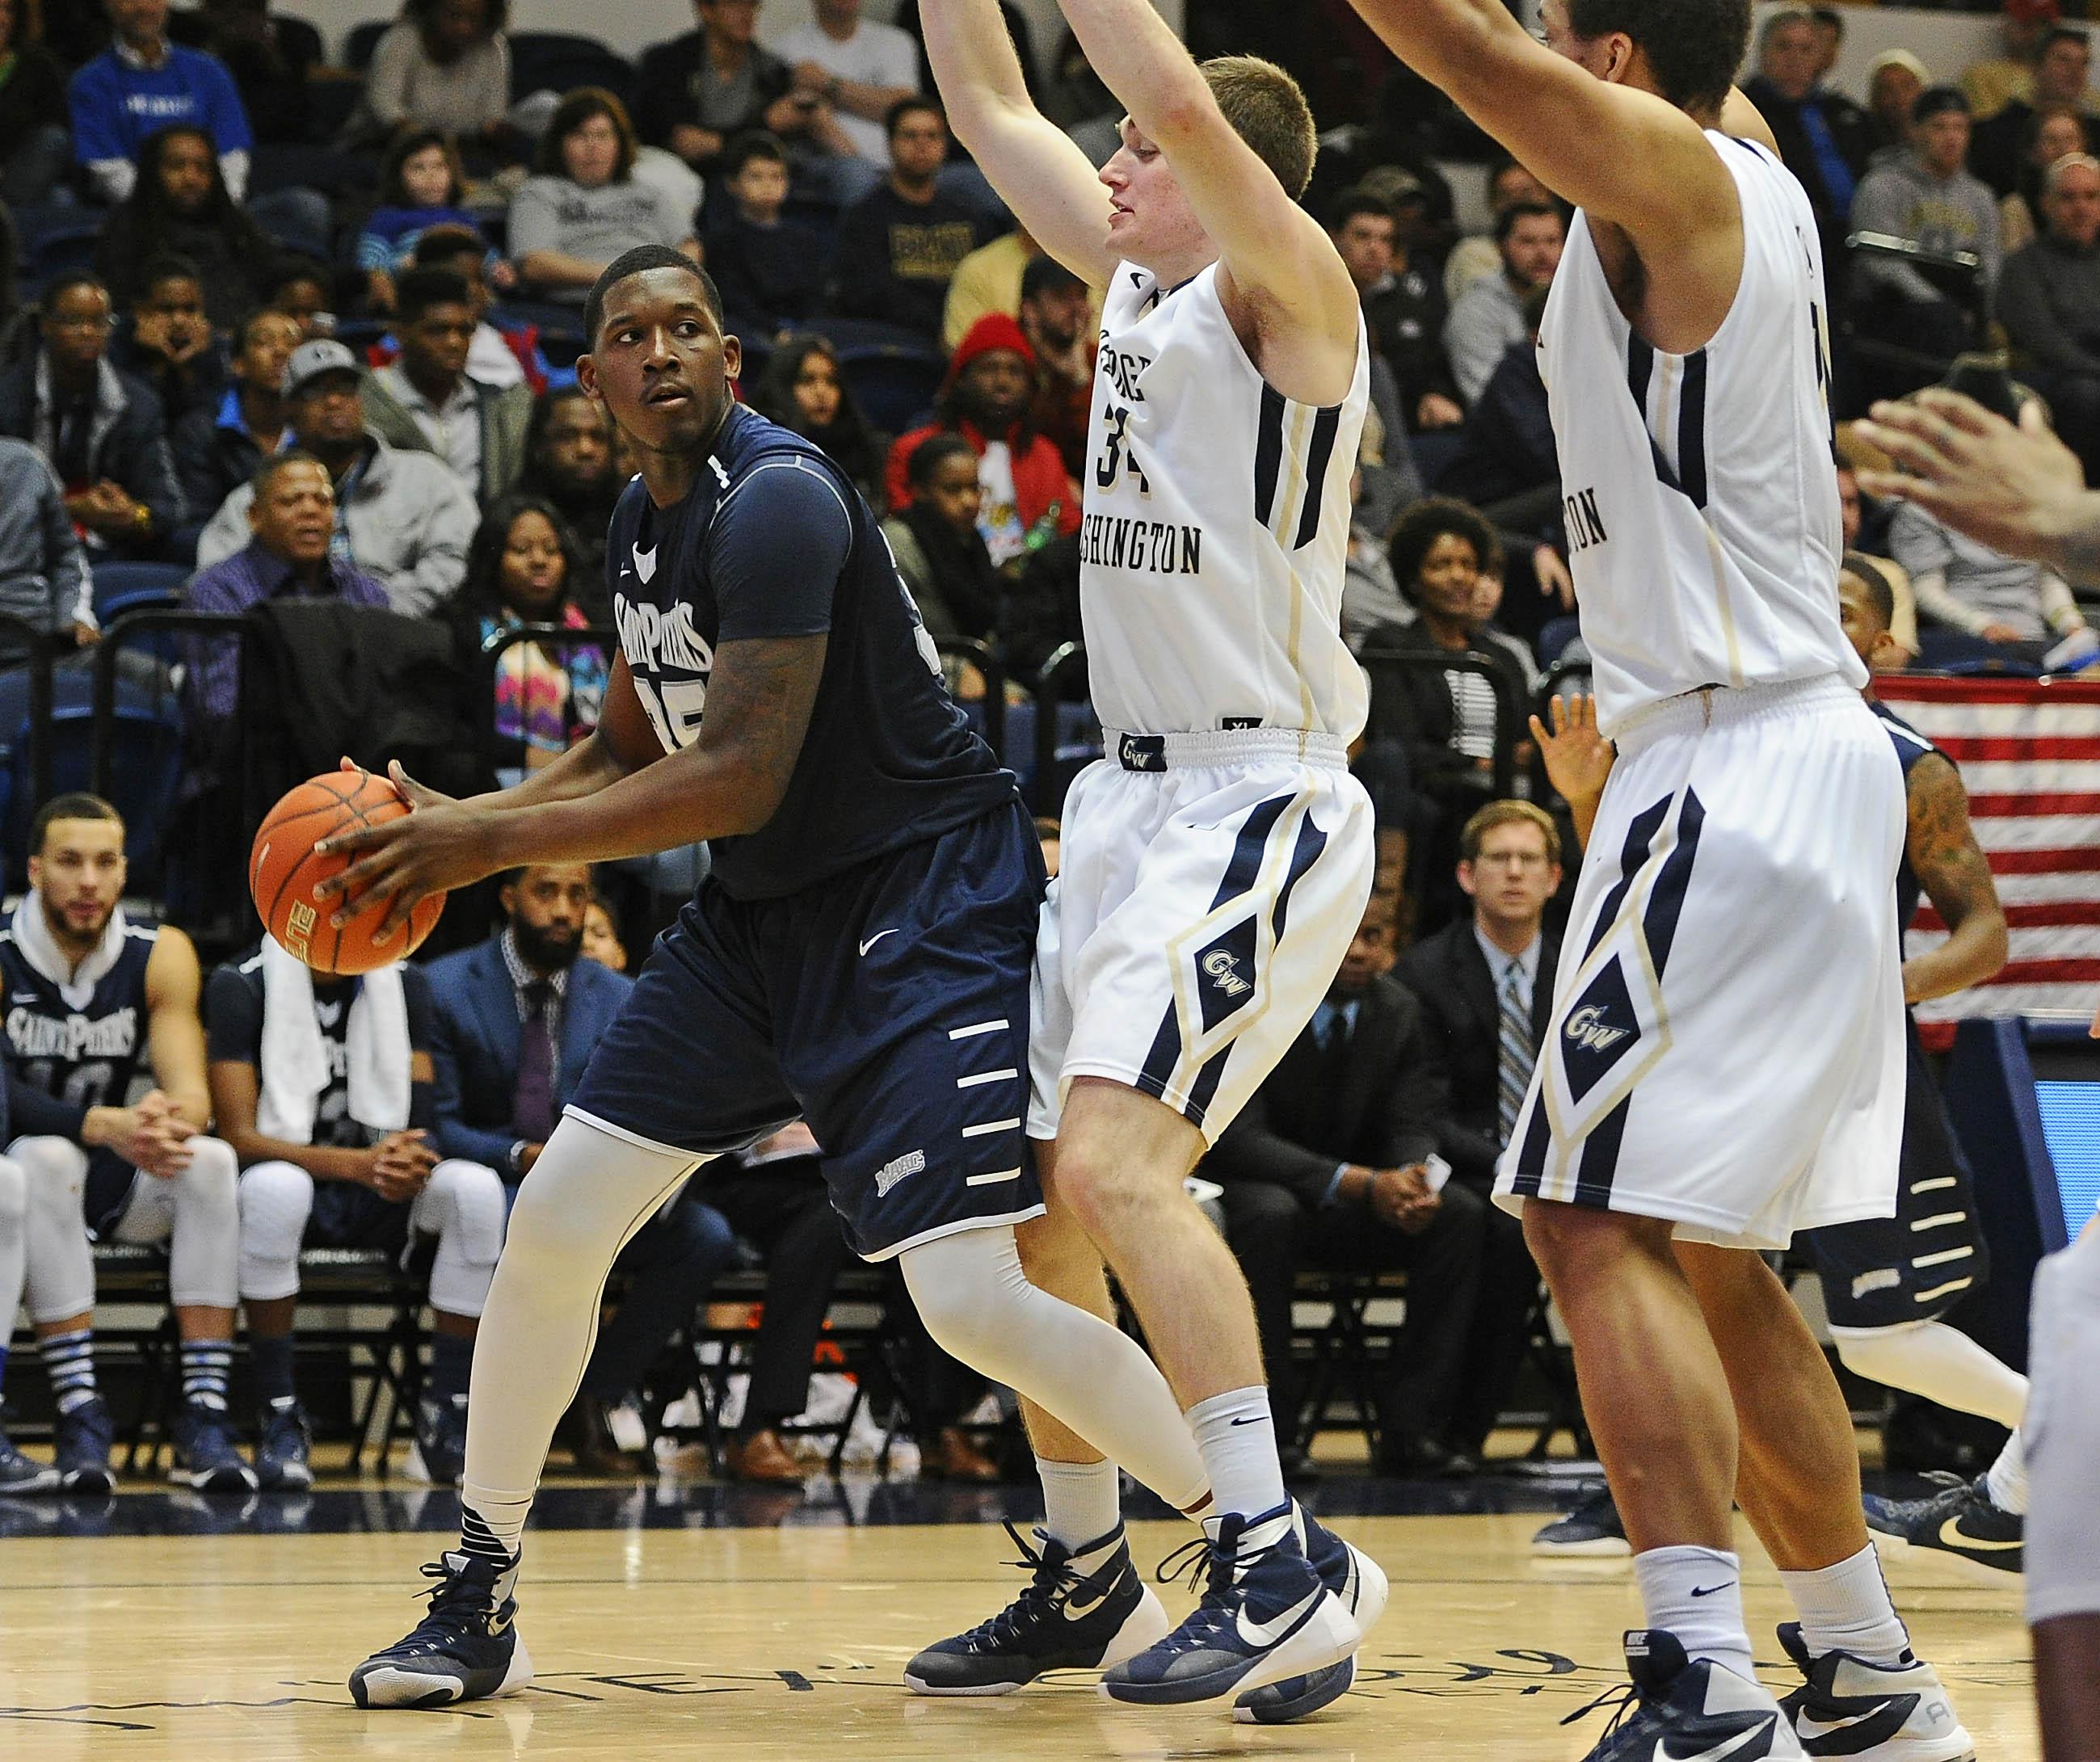 NCAA Basketball: St. Peter's at George Washington